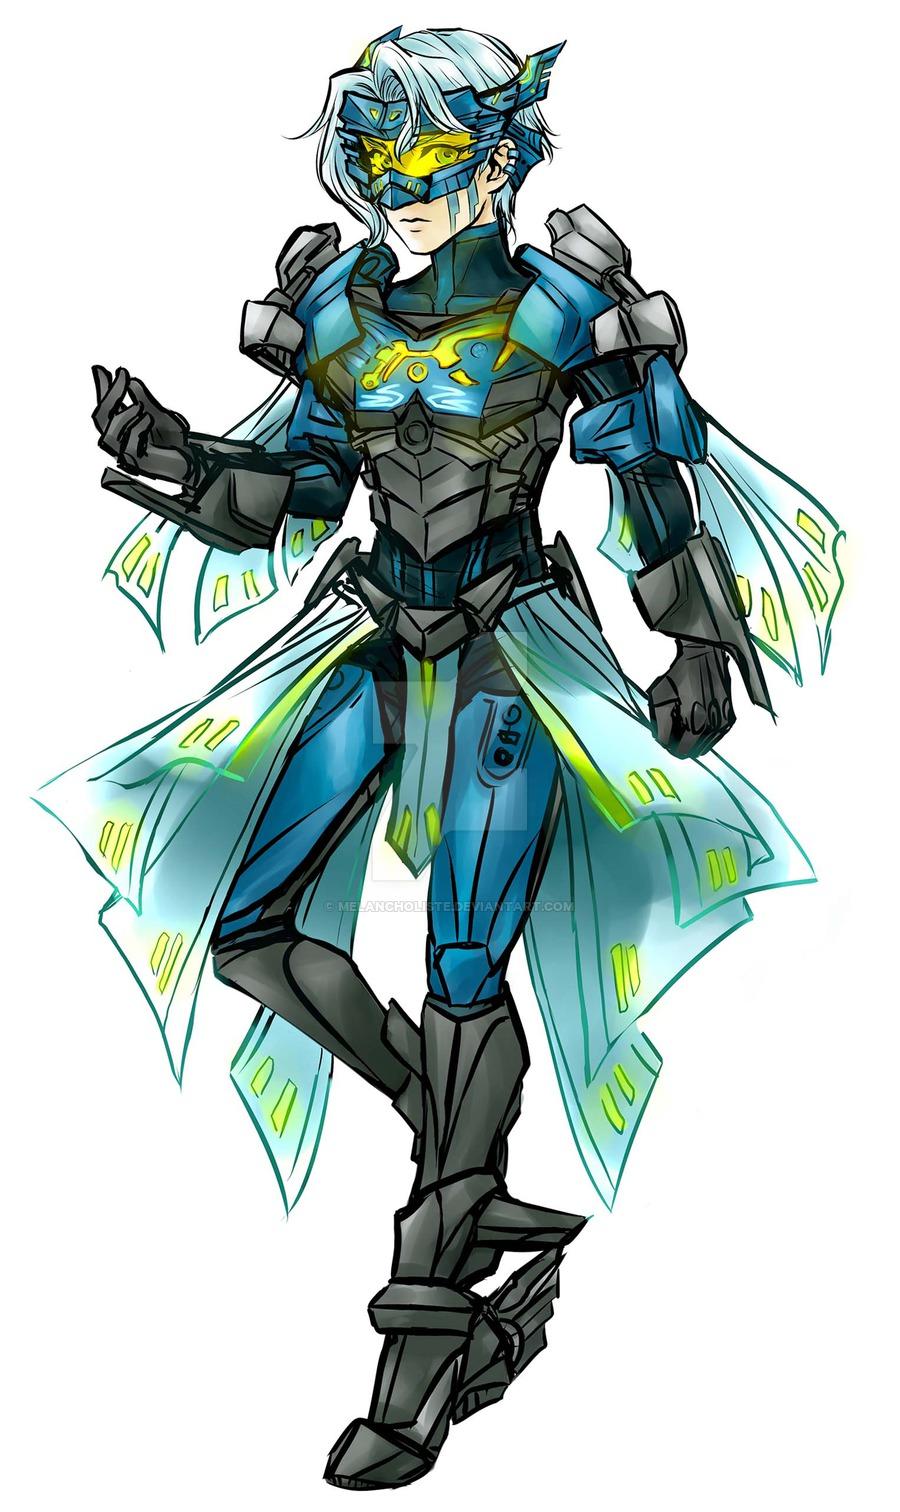 1girl armor bionicle blue_hair gali highres humanization lego melancholiste short_hair the_lego_group visor